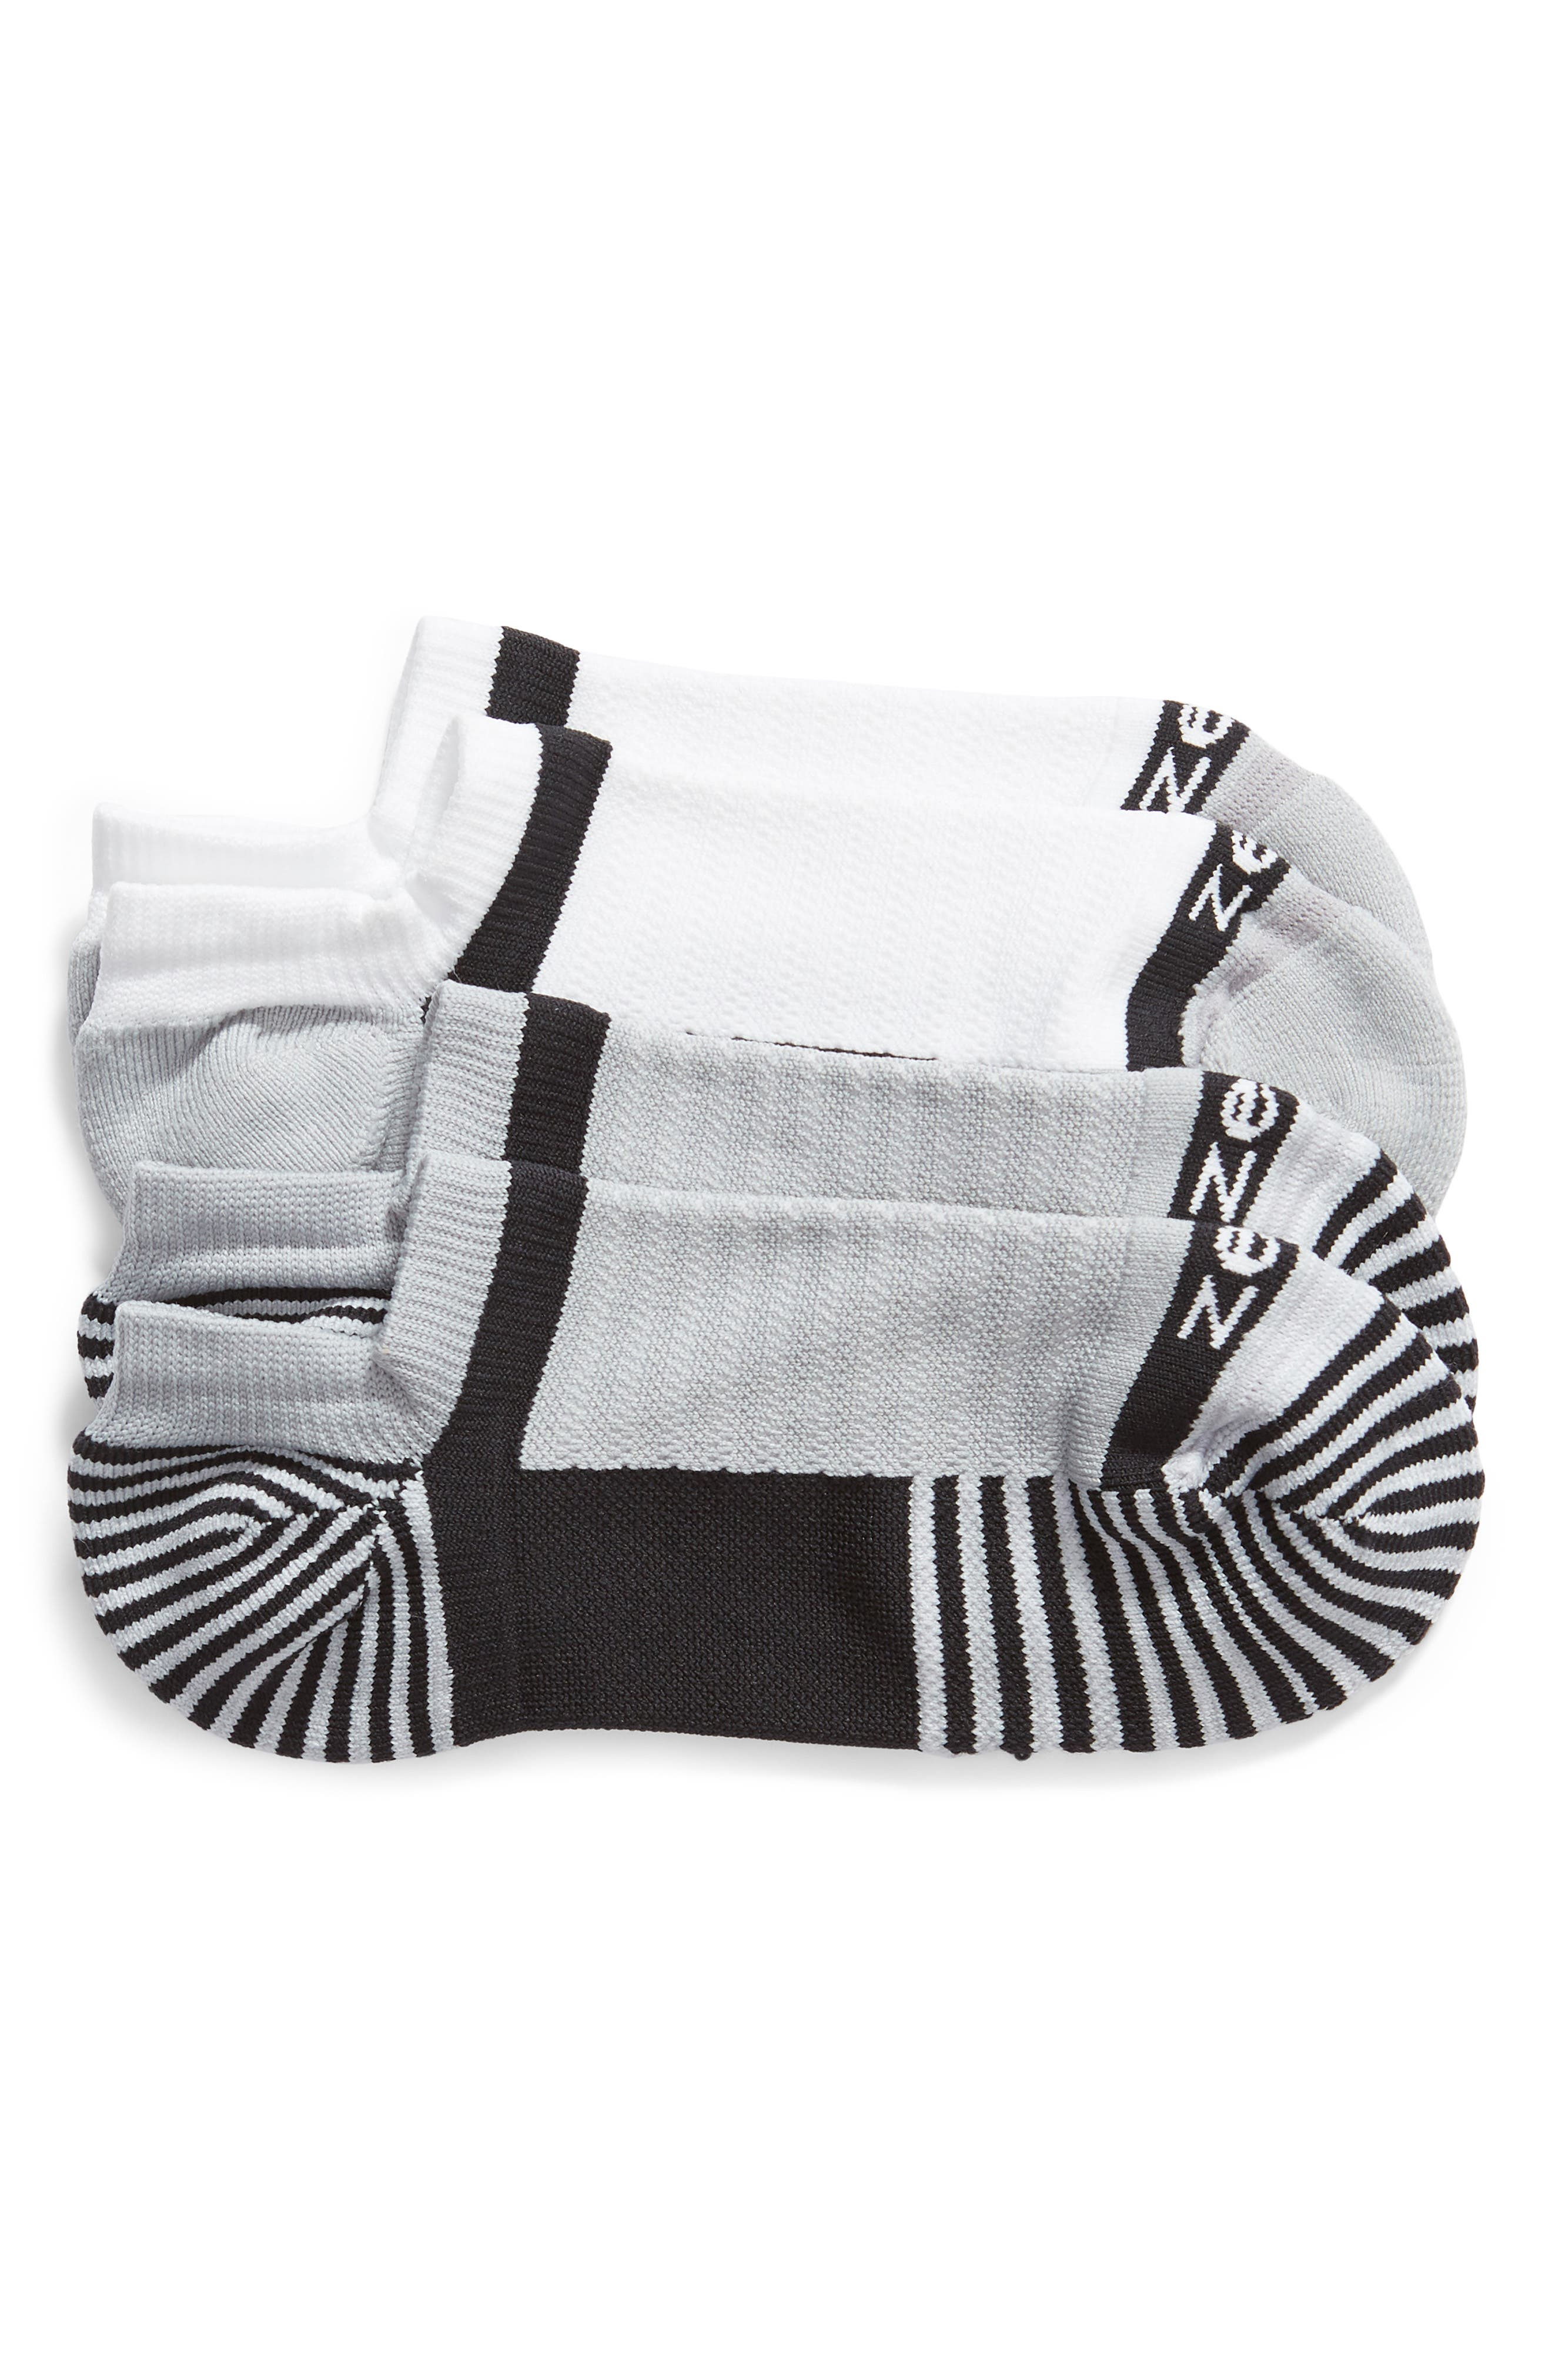 ZELLA,                             Two-Pack Training Socks,                             Main thumbnail 1, color,                             BLACK